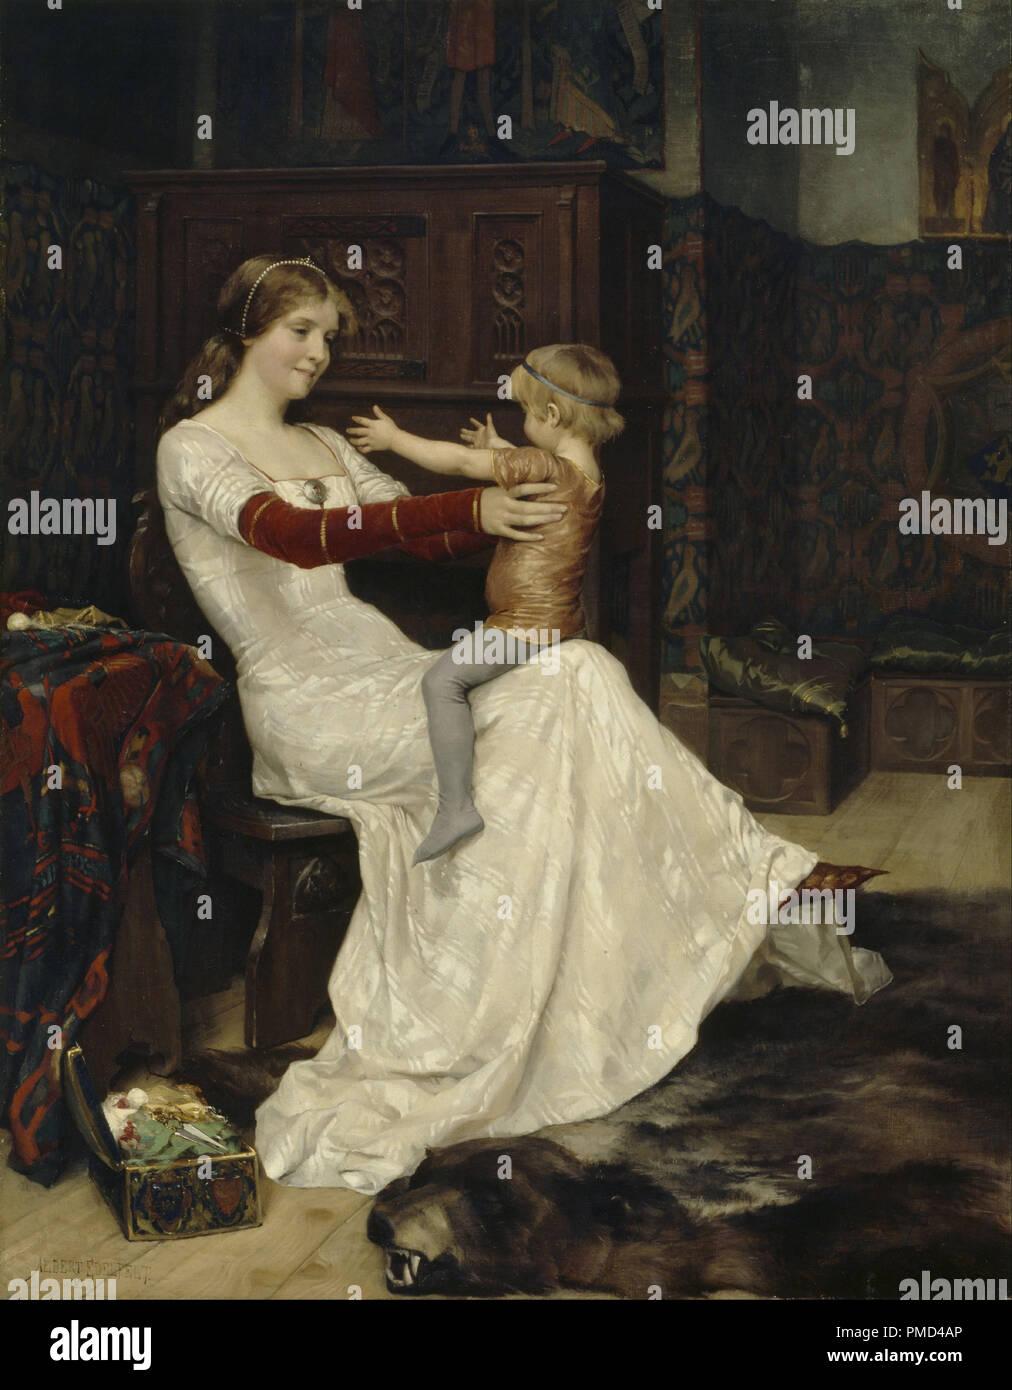 Queen Bianca. Date/Period: 1877. Painting. Oil on canvas. Height: 96.5 cm (37.9 in); Width: 75.5 cm (29.7 in). Author: Albert Edelfelt. Edelfelt, Albert Gustaf Aristides. Stock Photo